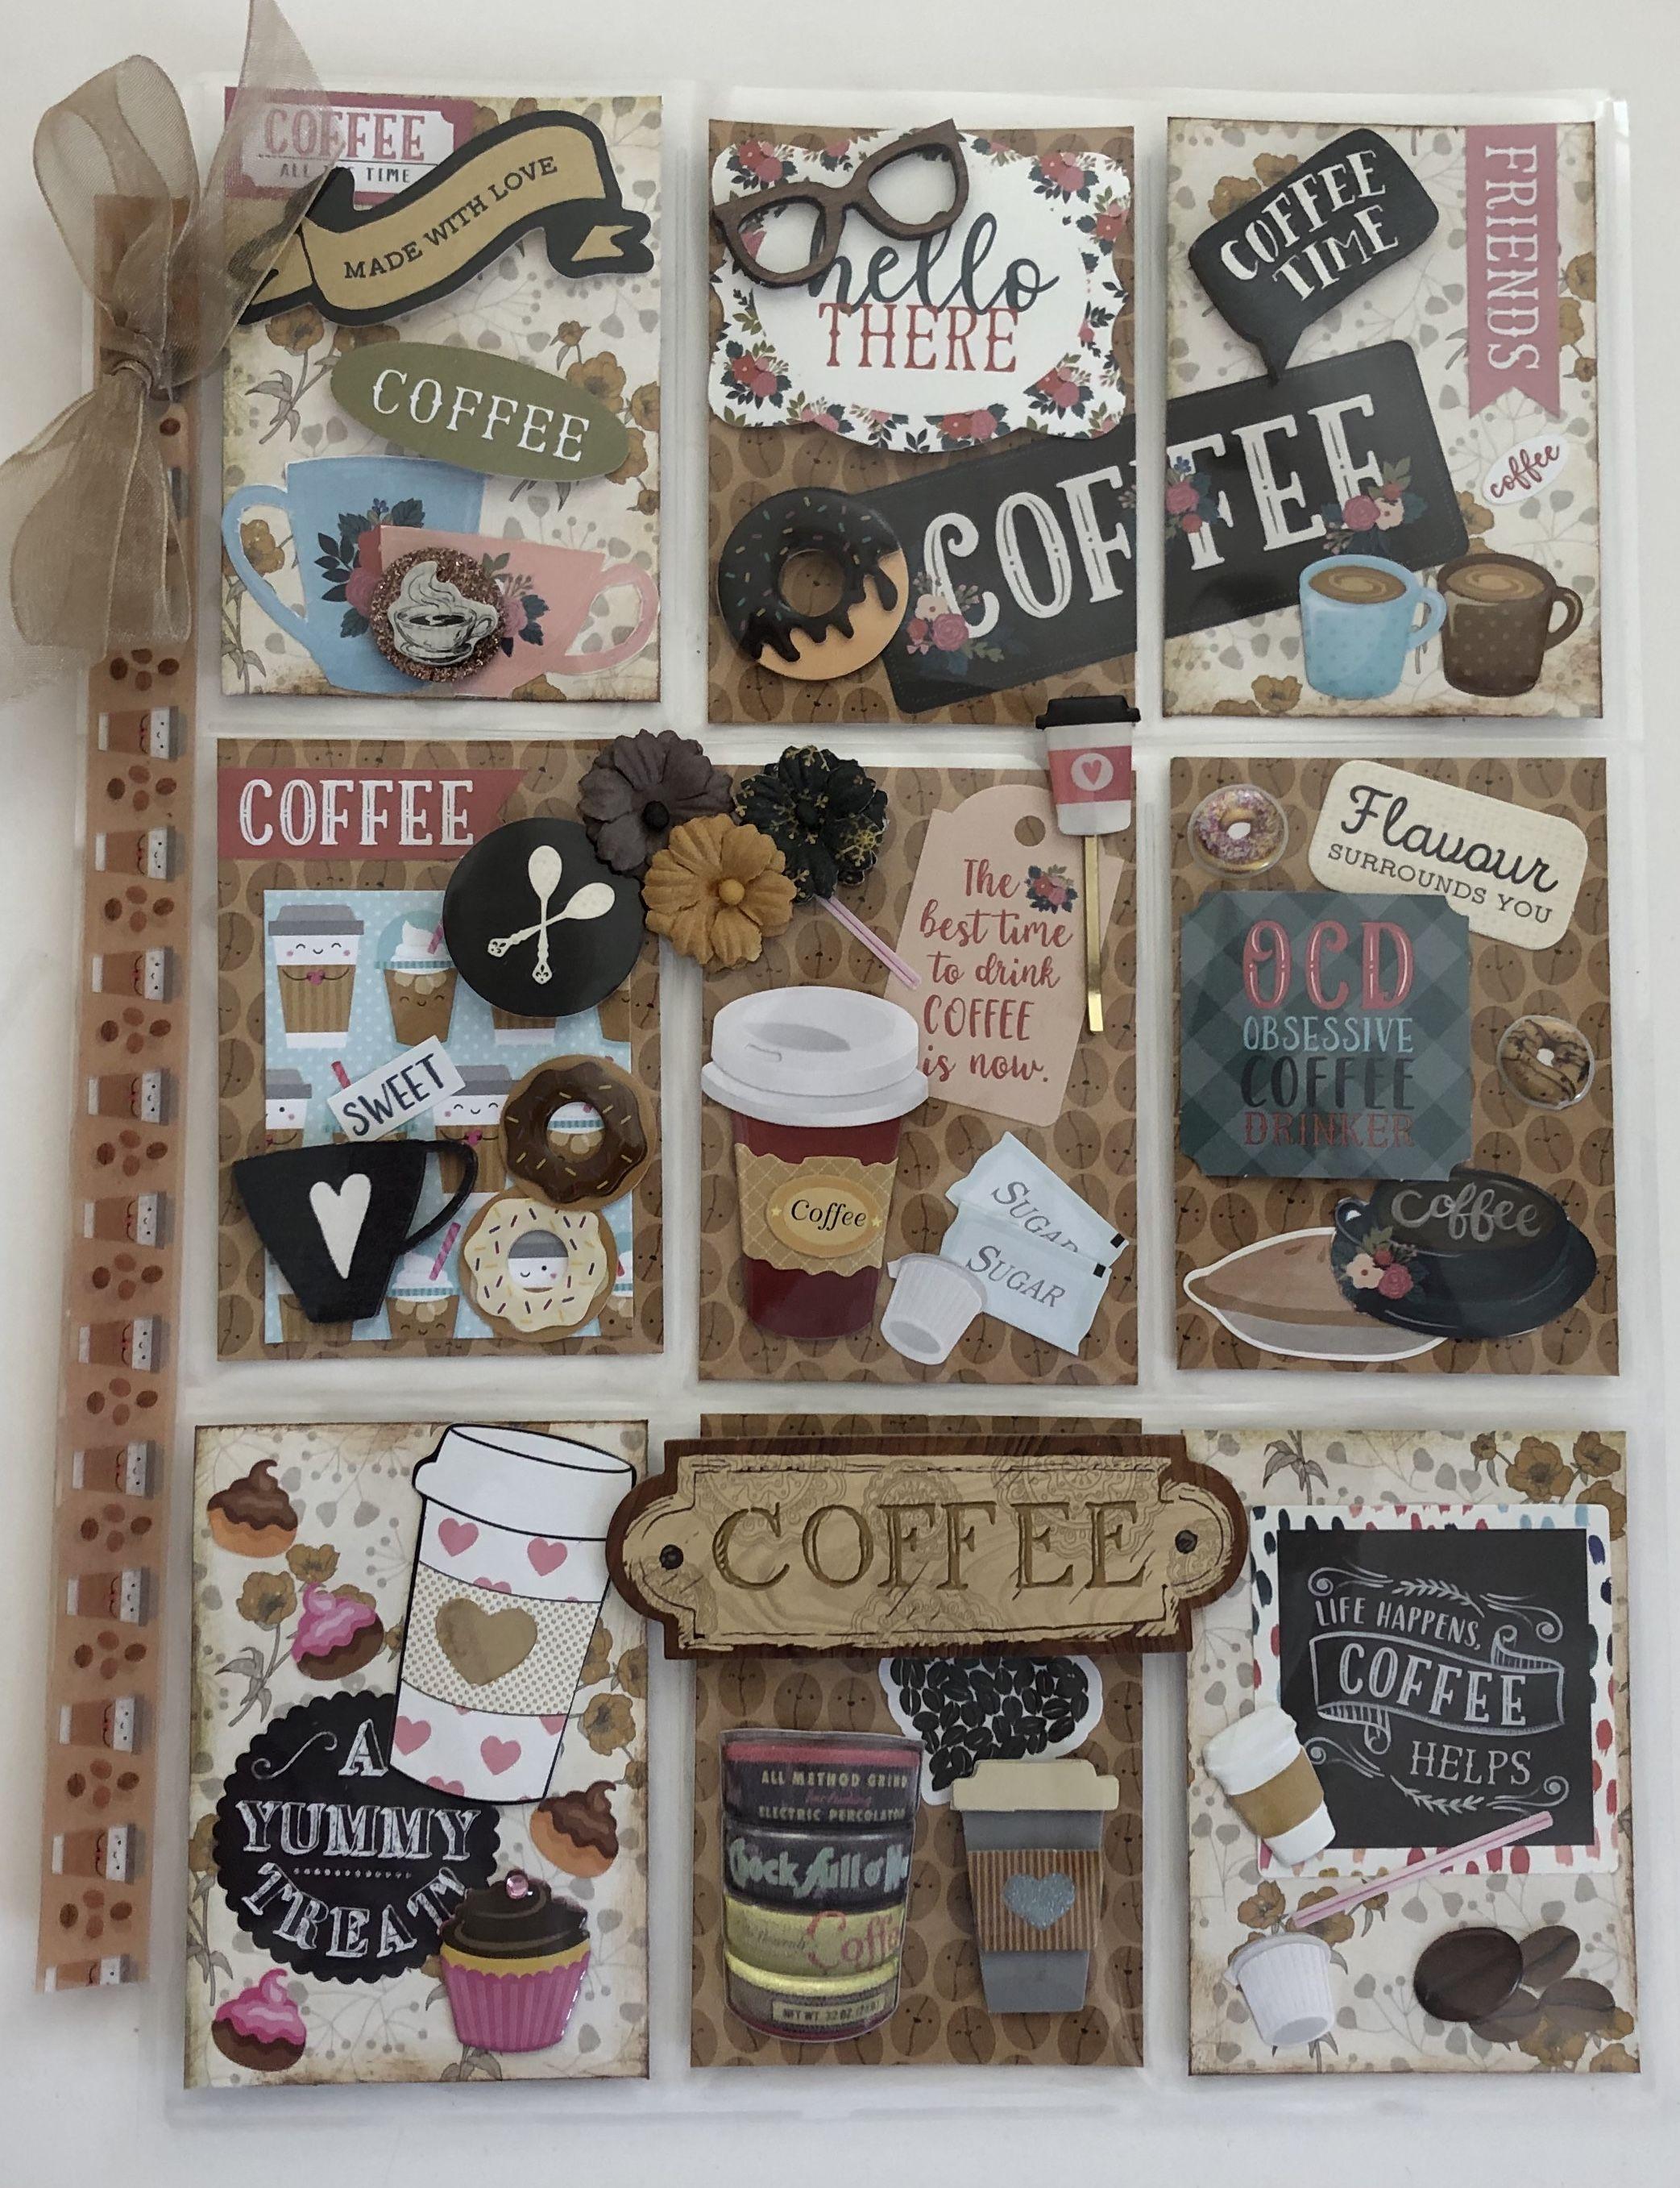 Pin by Joan Schultz on My Pocket letters in 2020 Coffee